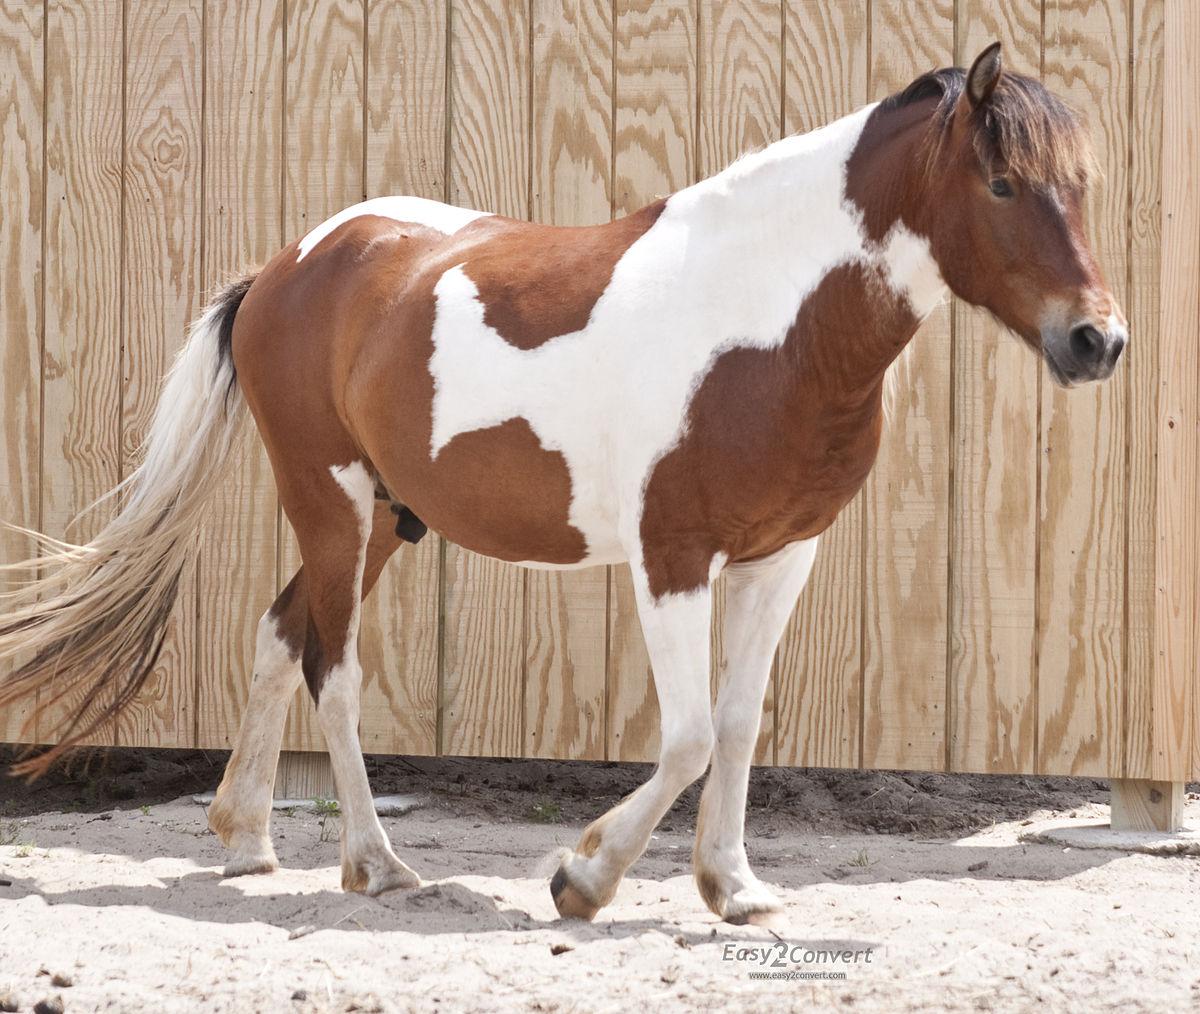 Horse_at_Ocracoke_Pony_Pen_by_Bonnie_Gruenberg